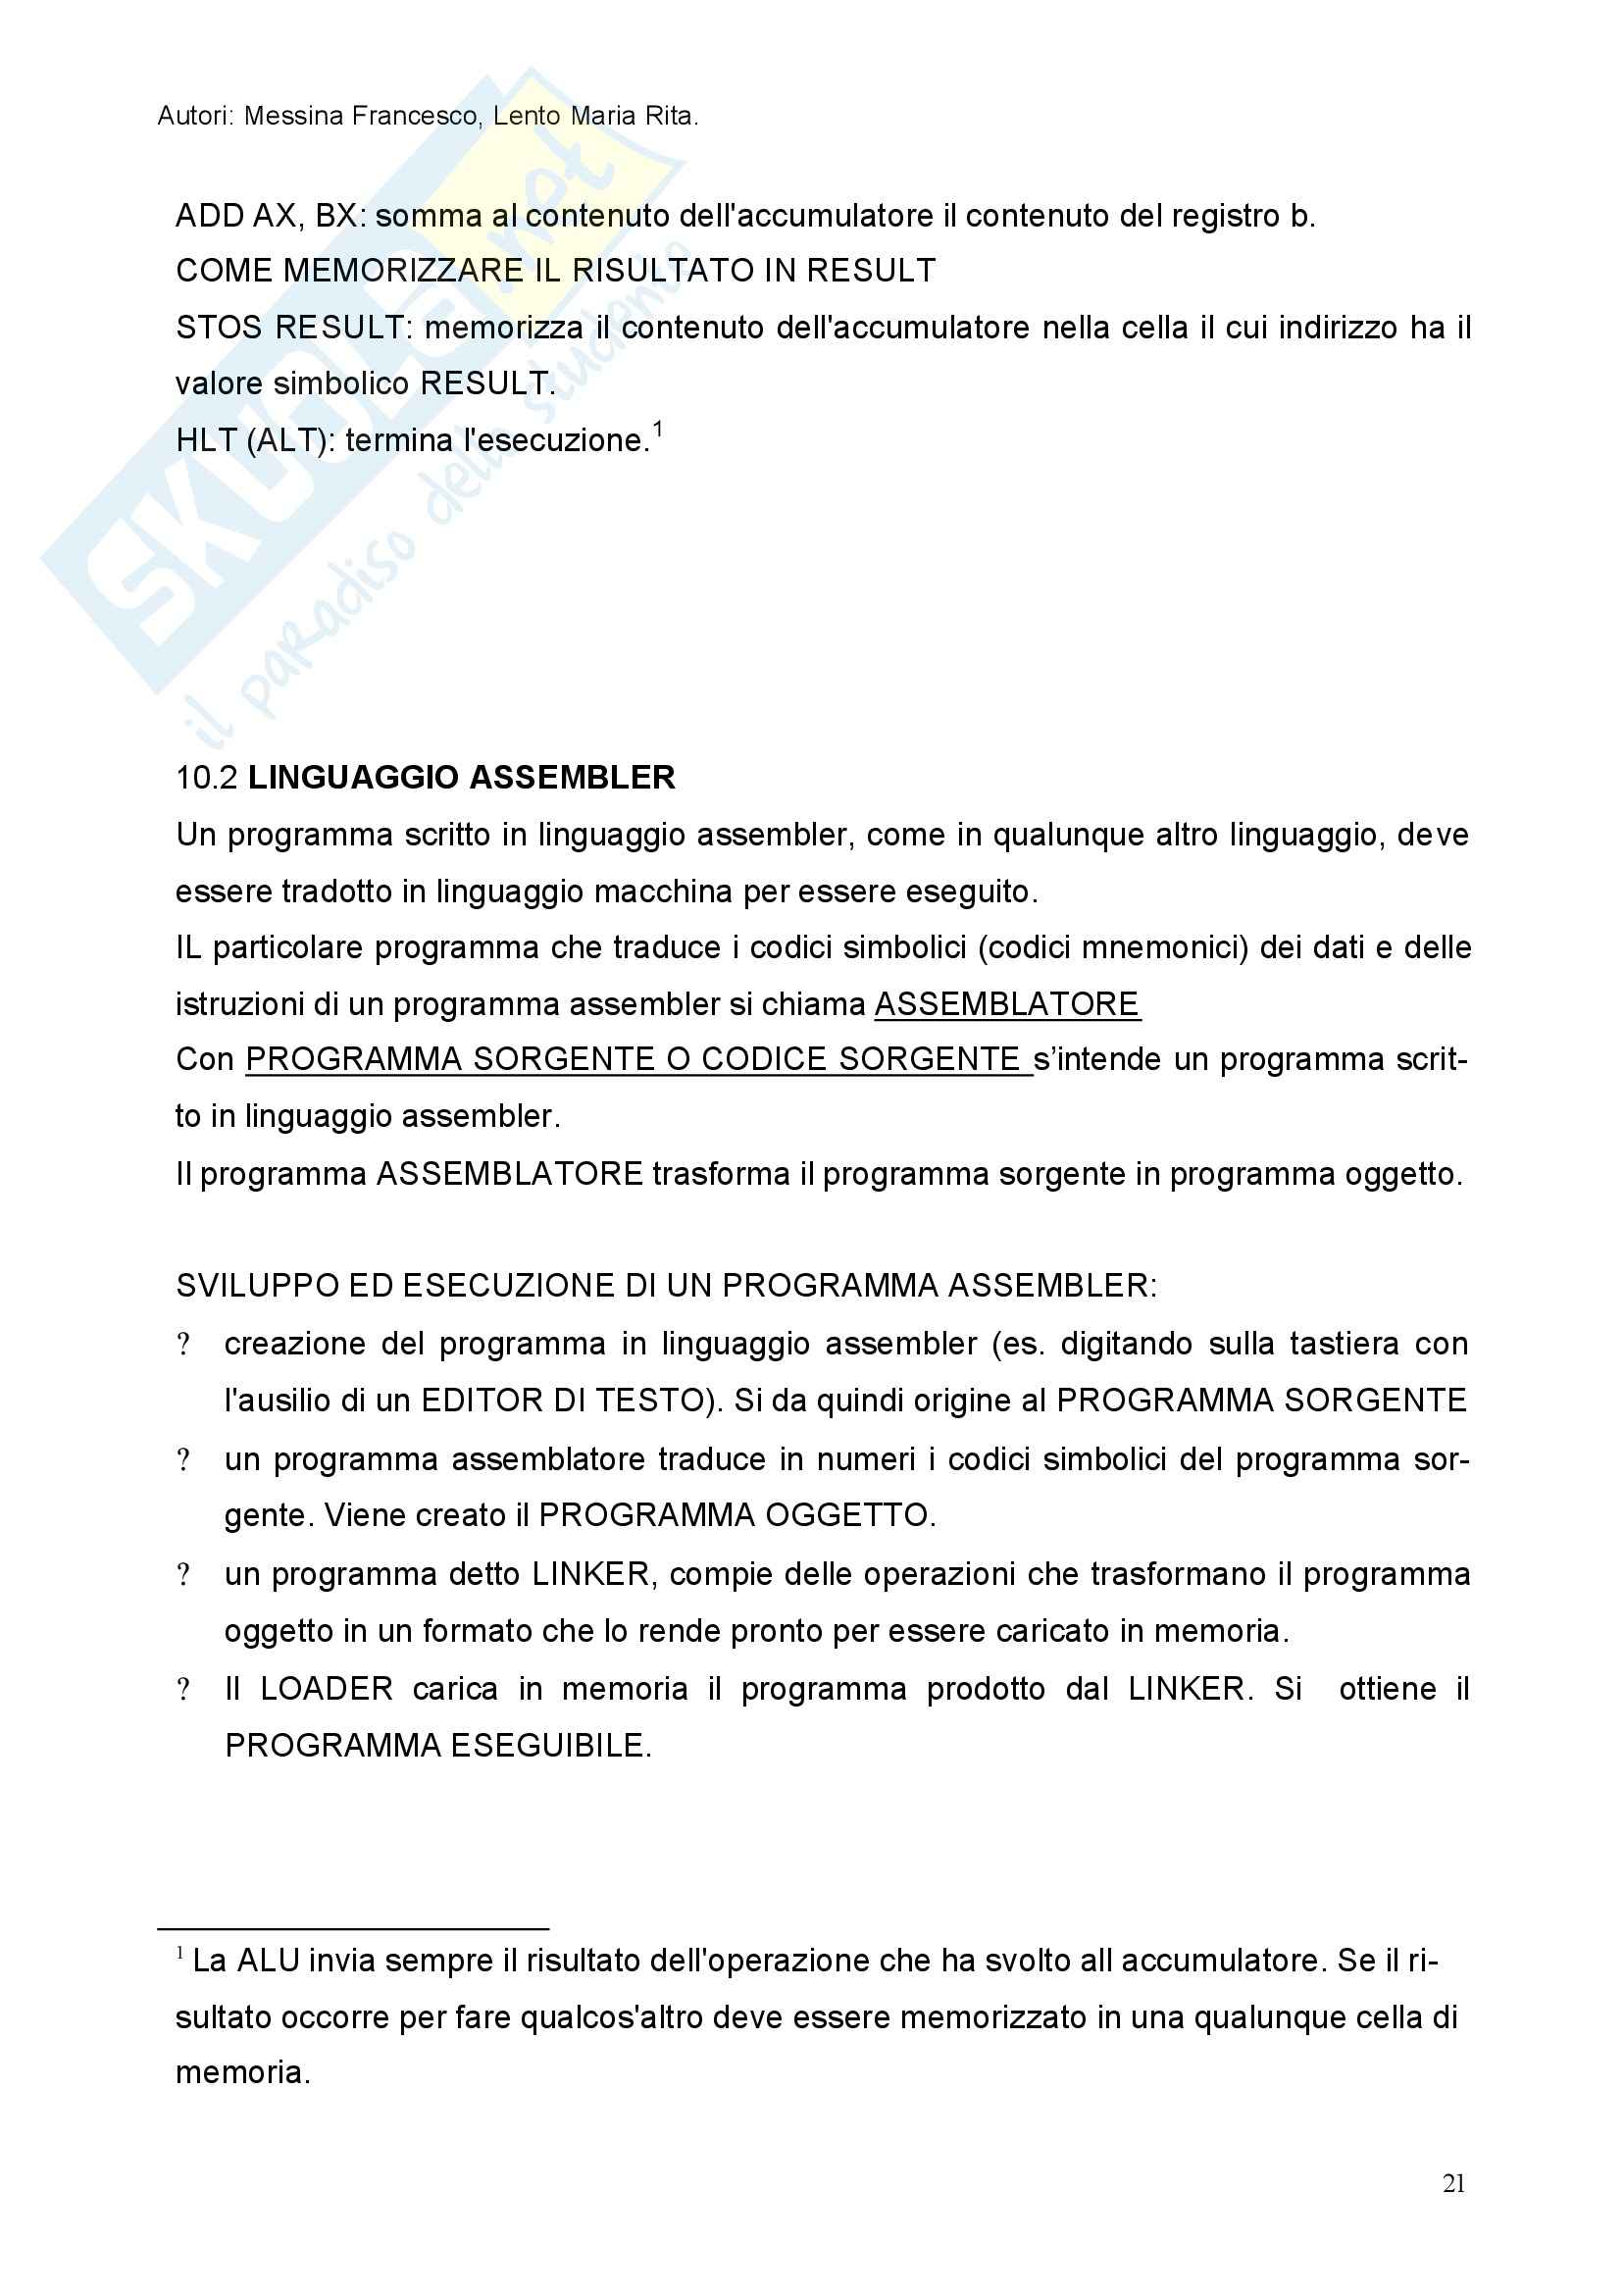 Informatica di base - nozioni generali Pag. 21